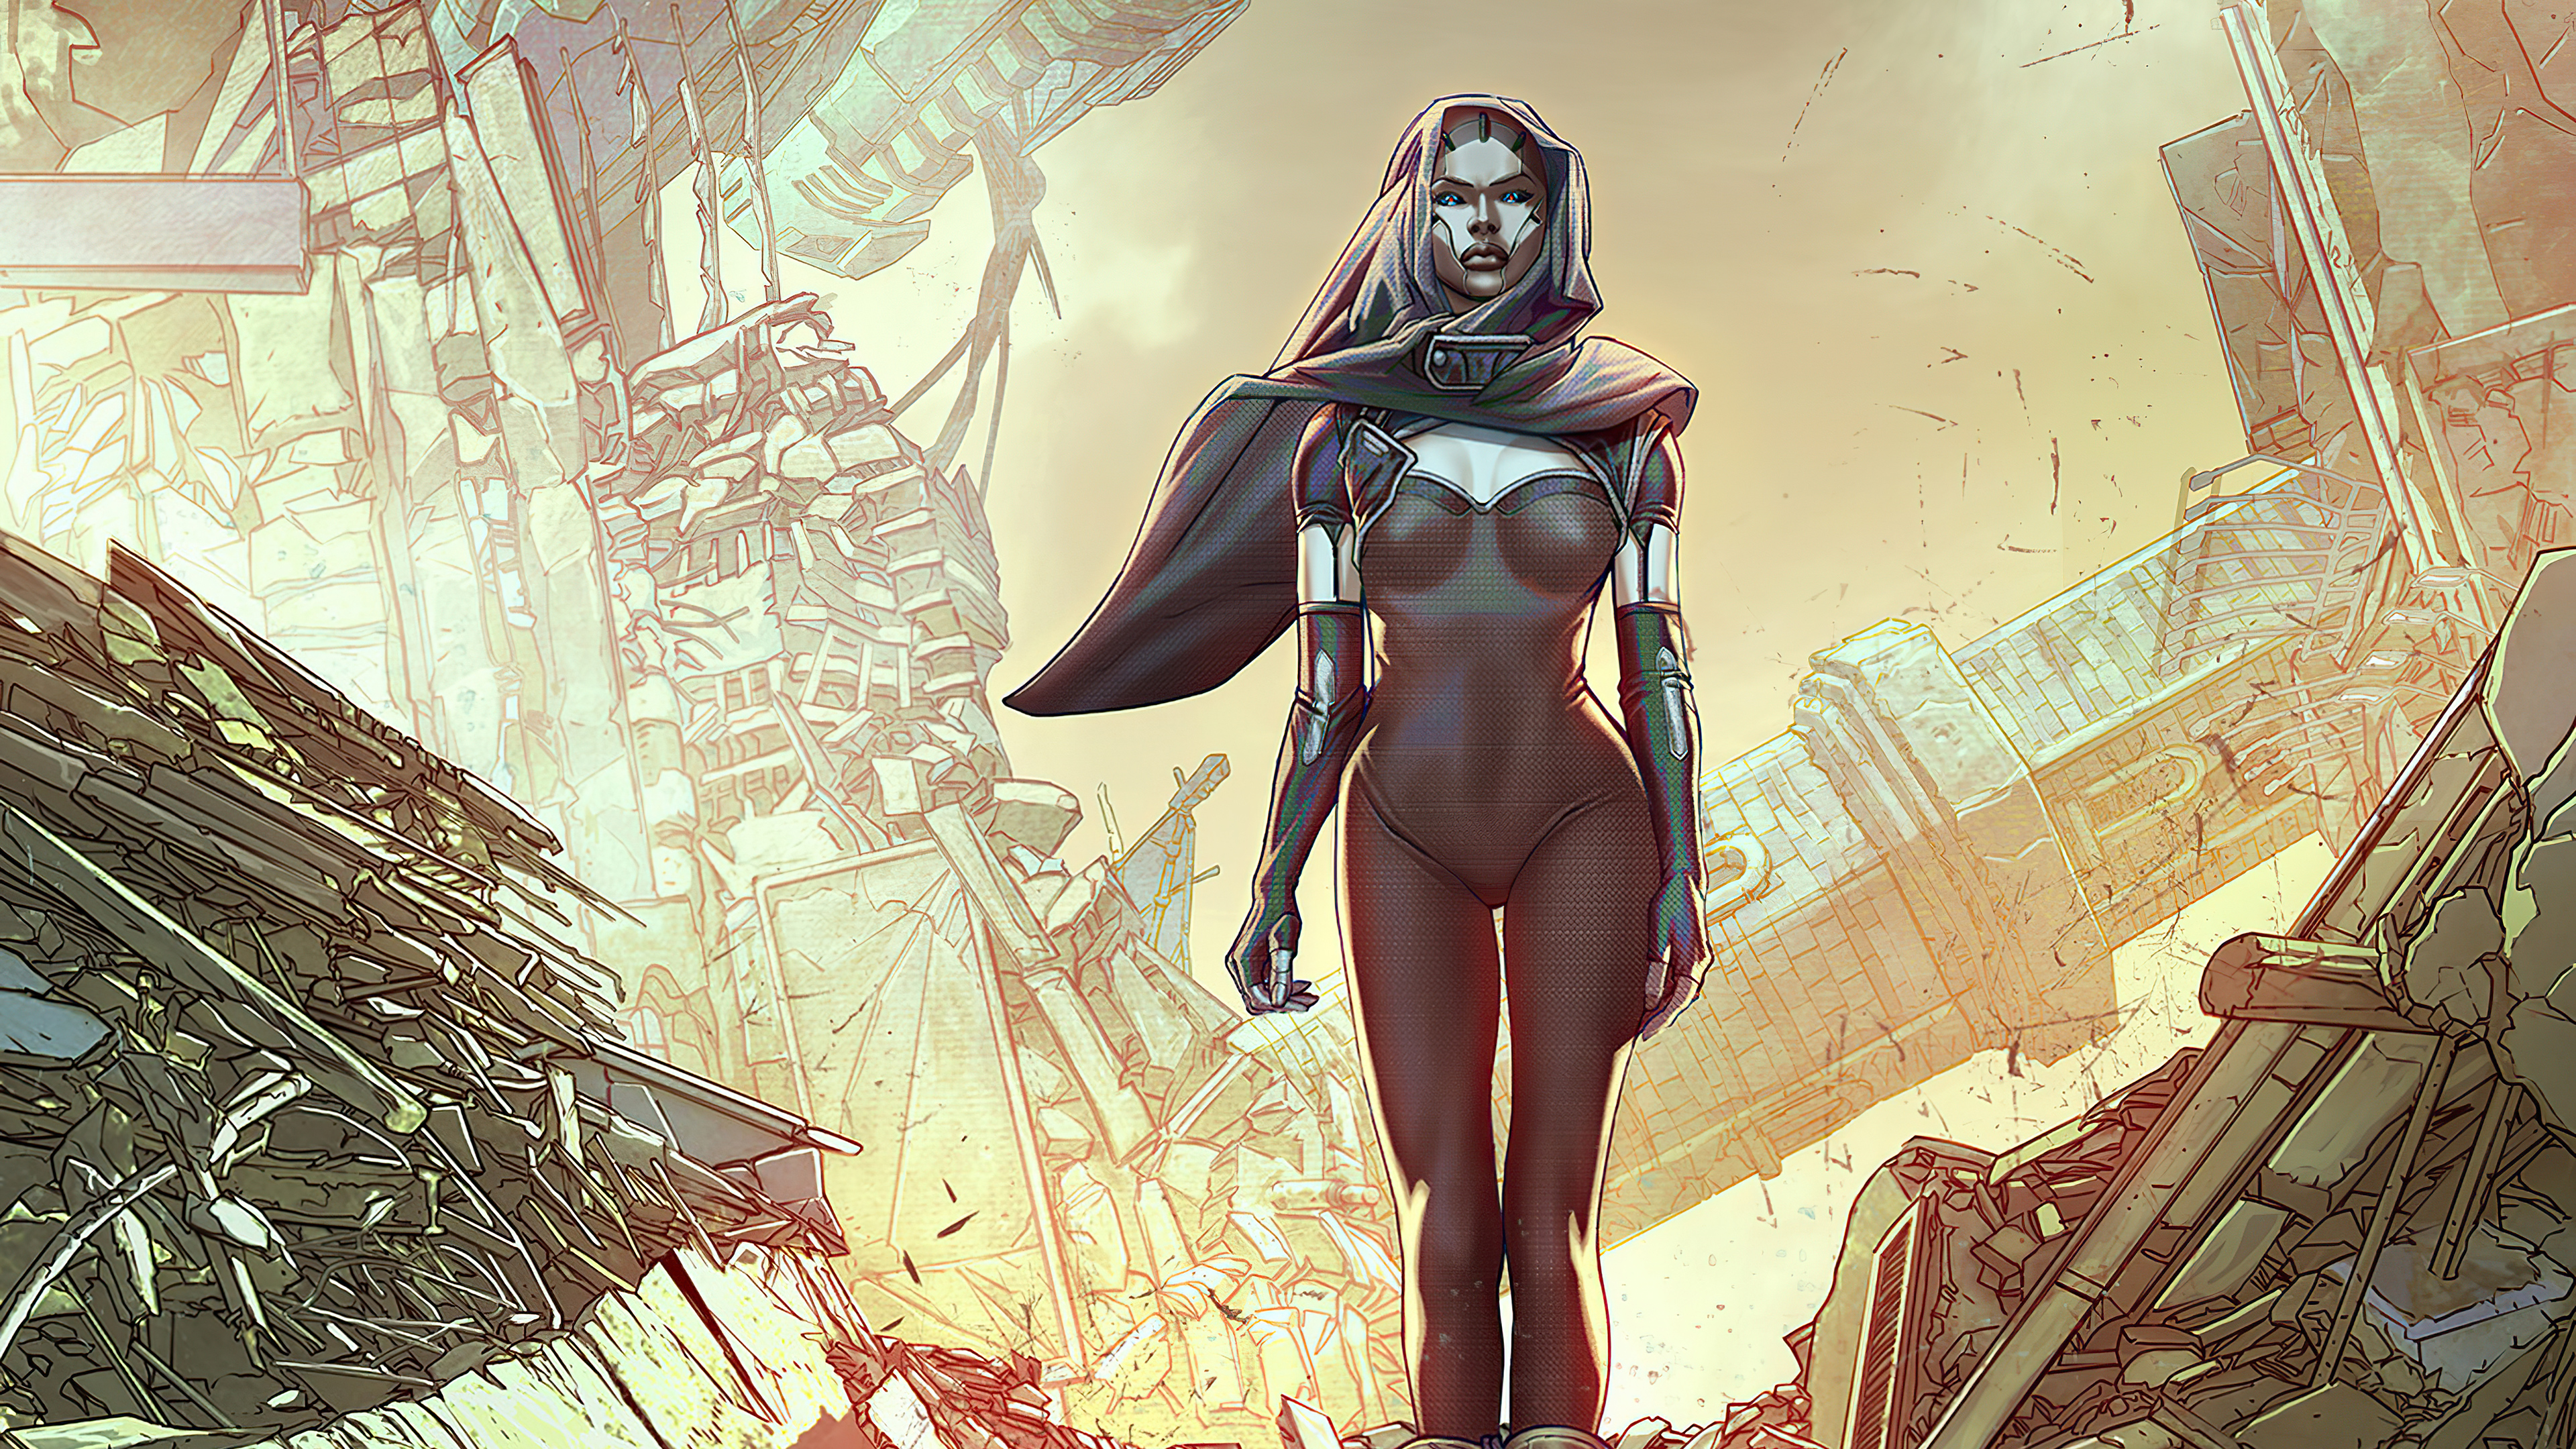 androids cyborg girl 4k 1608622906 - Androids Cyborg Girl 4k - Androids Cyborg Girl 4k wallpapers